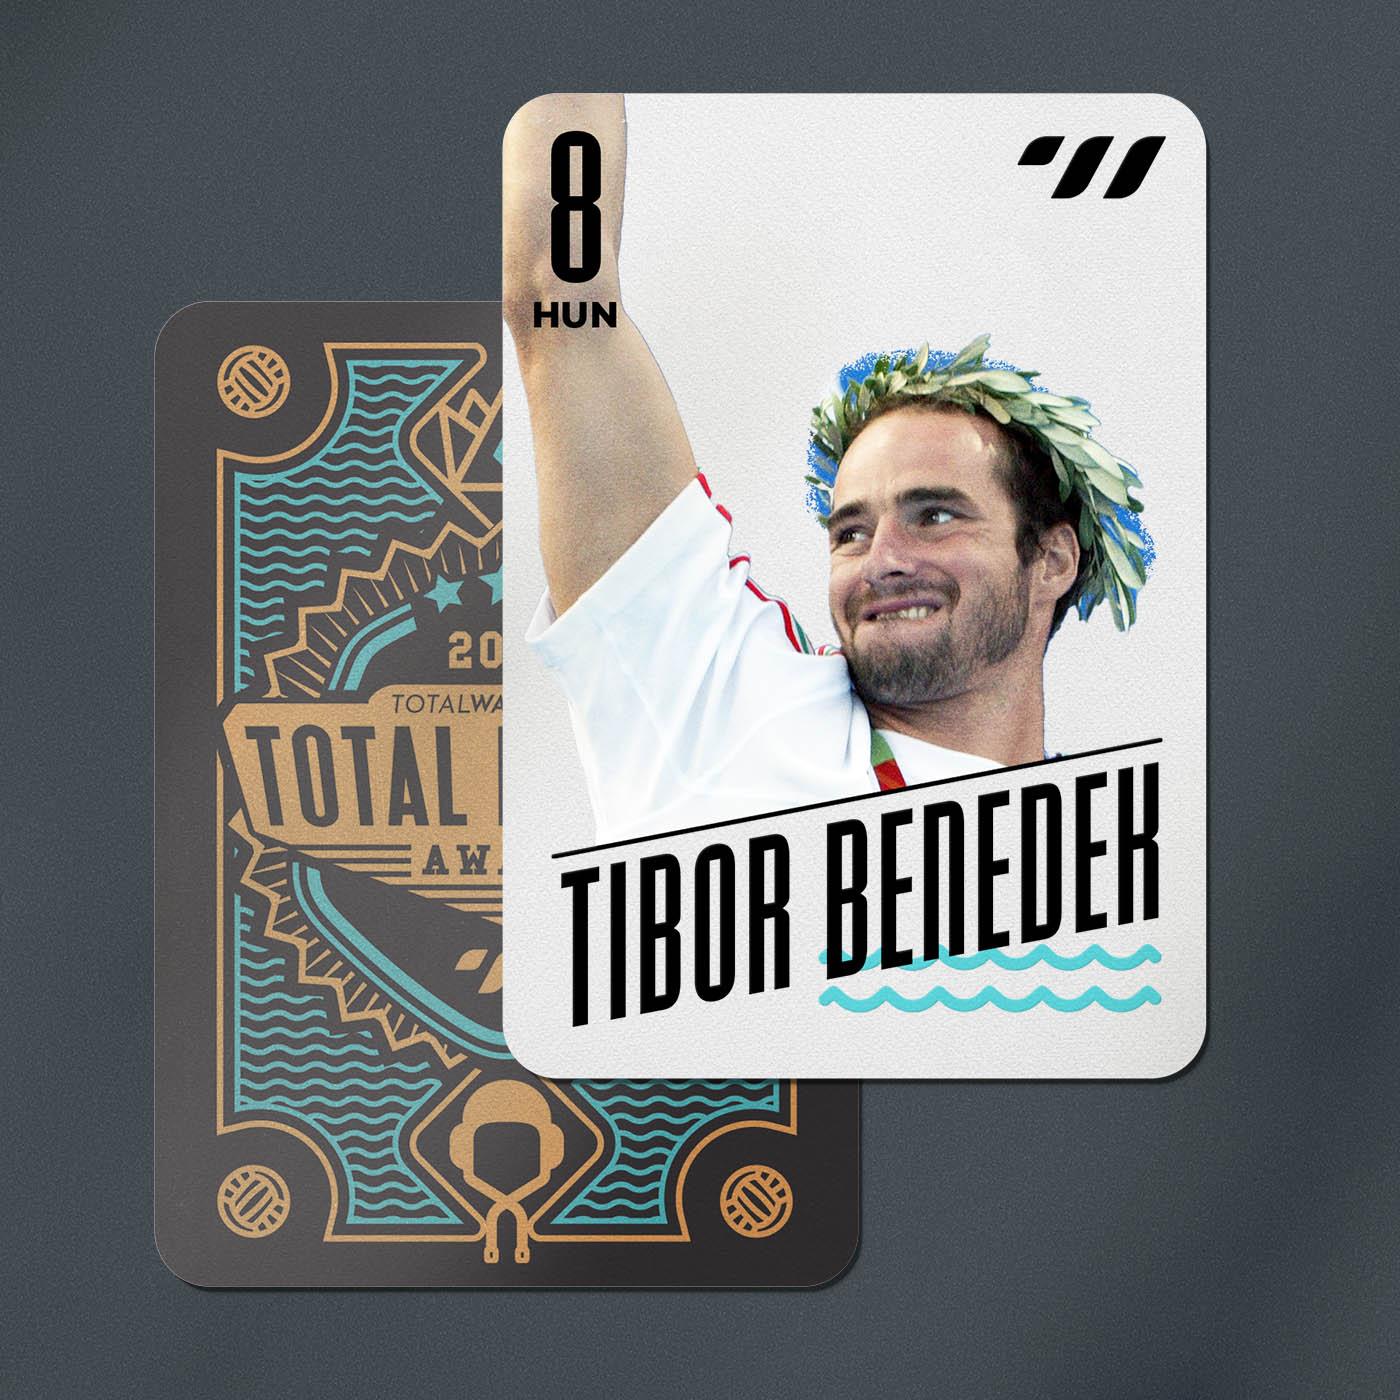 RIGHT DRIVER - Tibor Benedek (HUN)